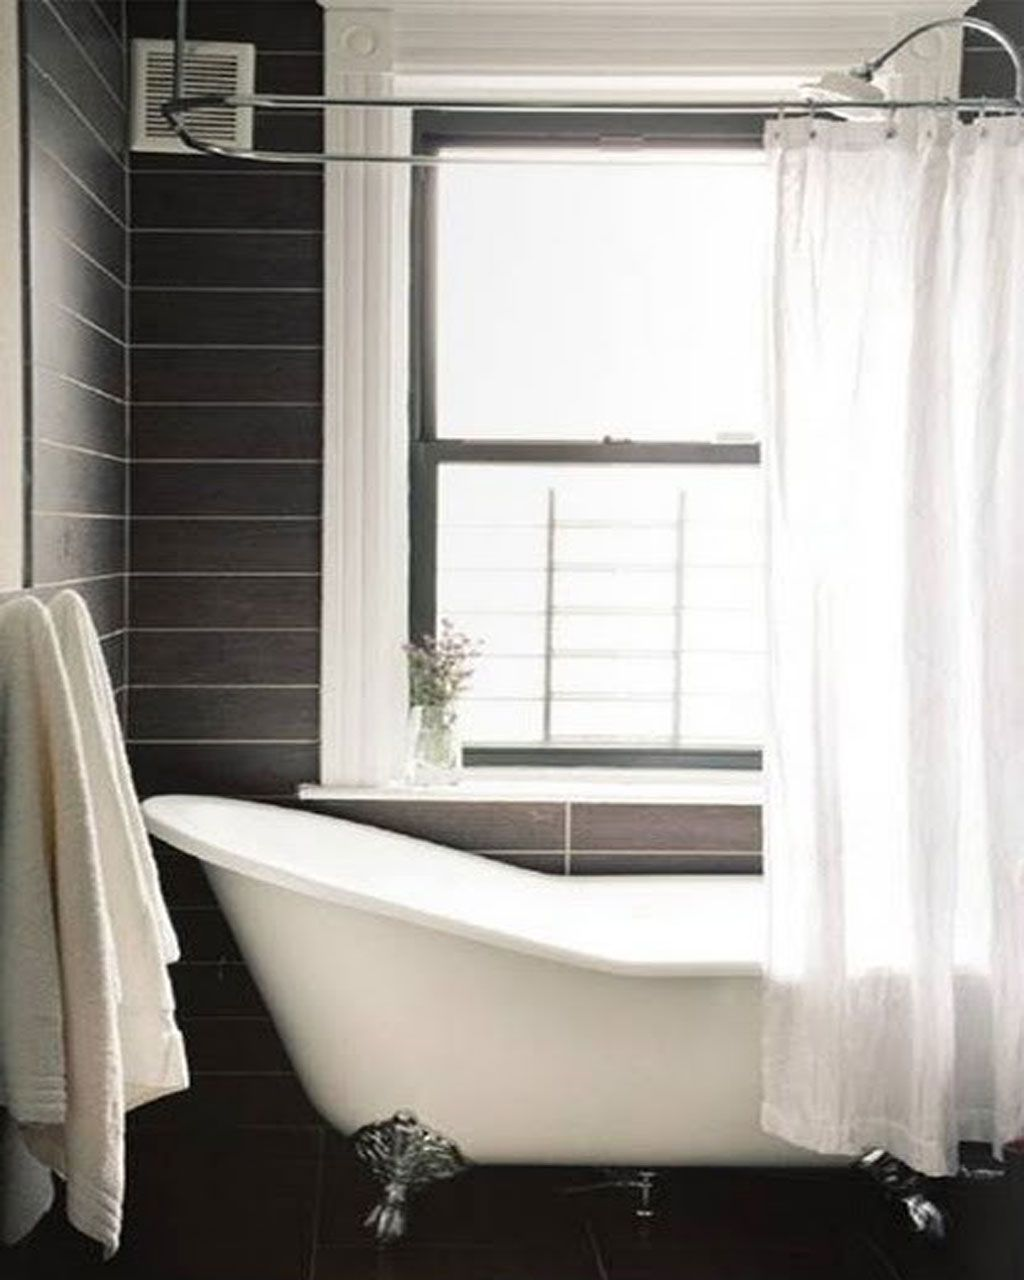 design of clawfoot tub unique image elegant shower homy the curtain